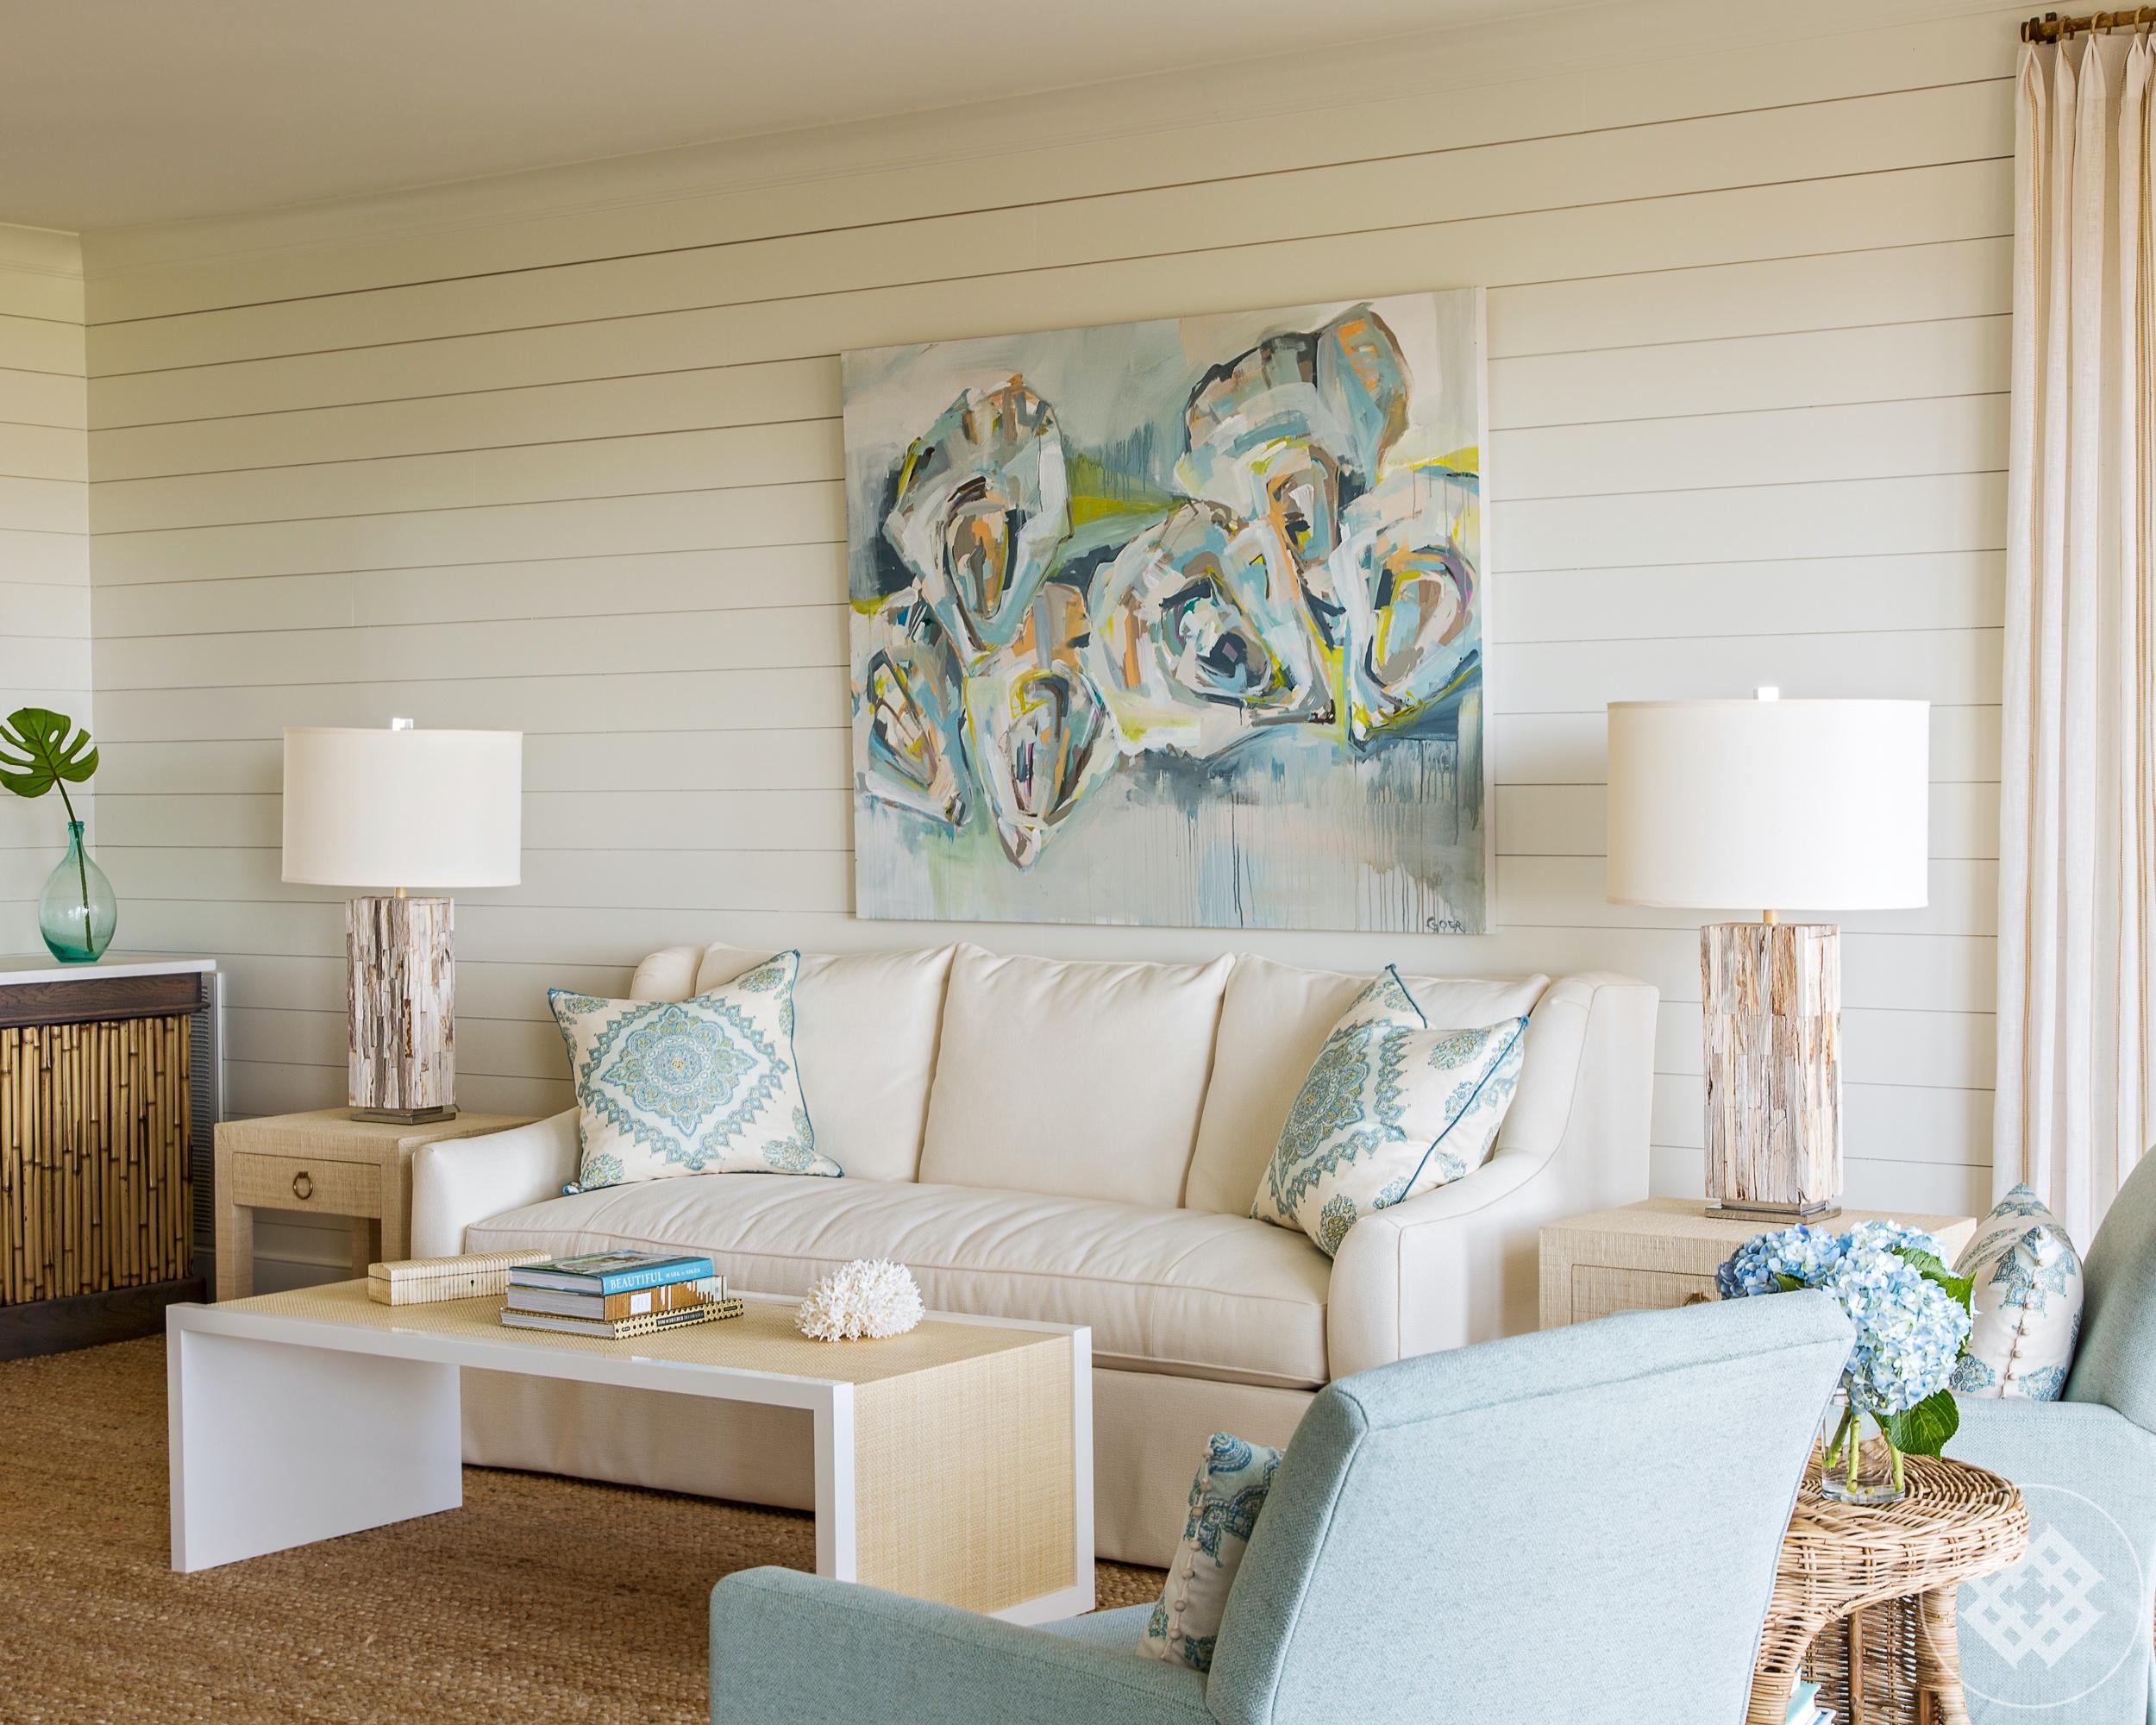 hss-living-room-seating-area.jpg